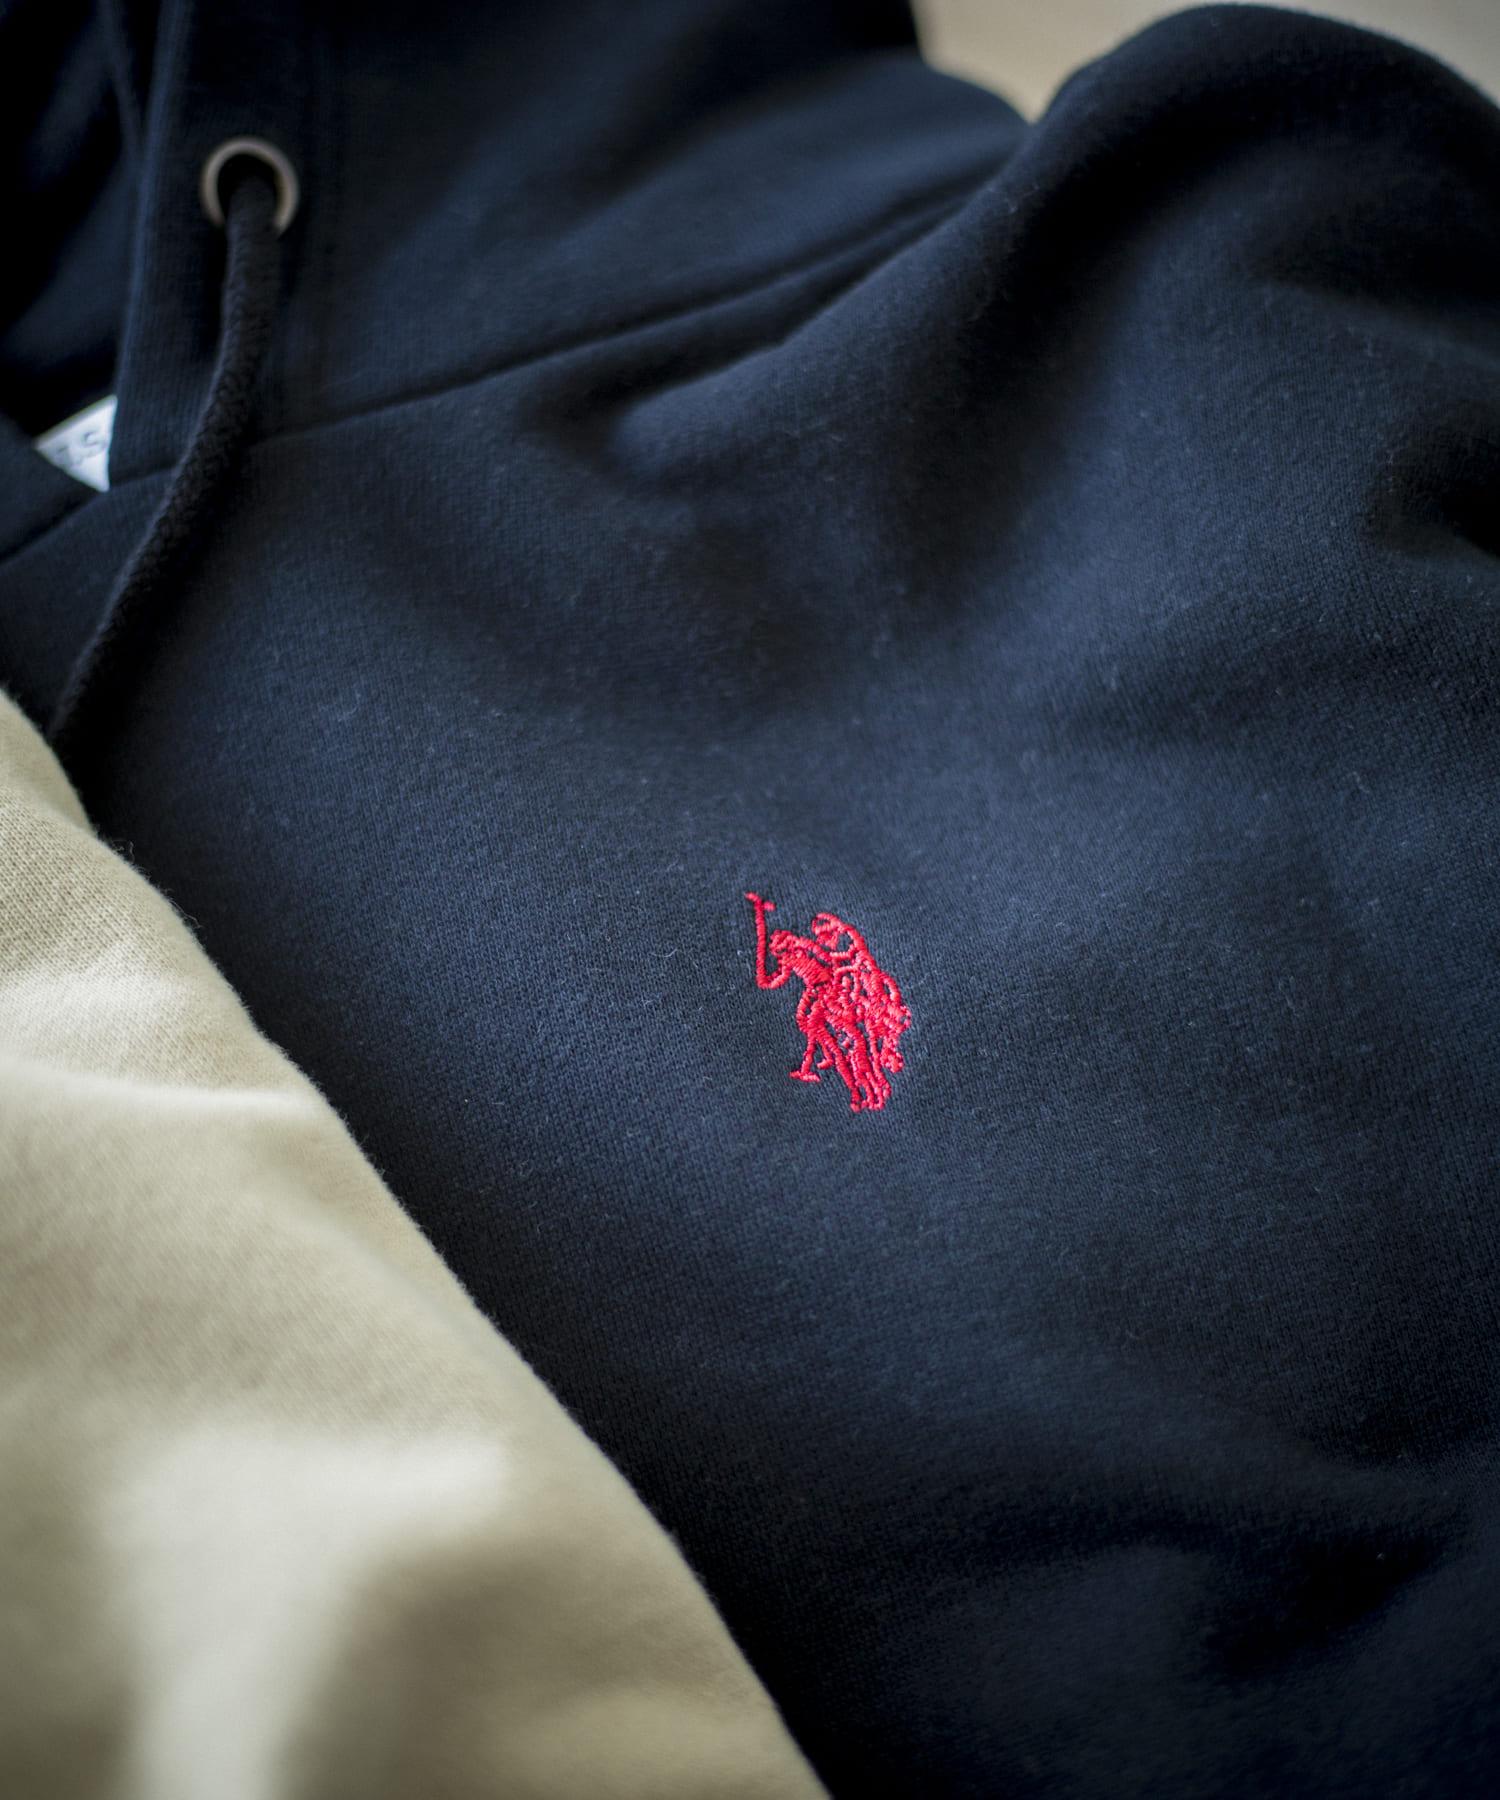 CPCM(シーピーシーエム) 【再入荷】U.S. POLO ASSN.ユーエスポロアッスン刺繍パーカー